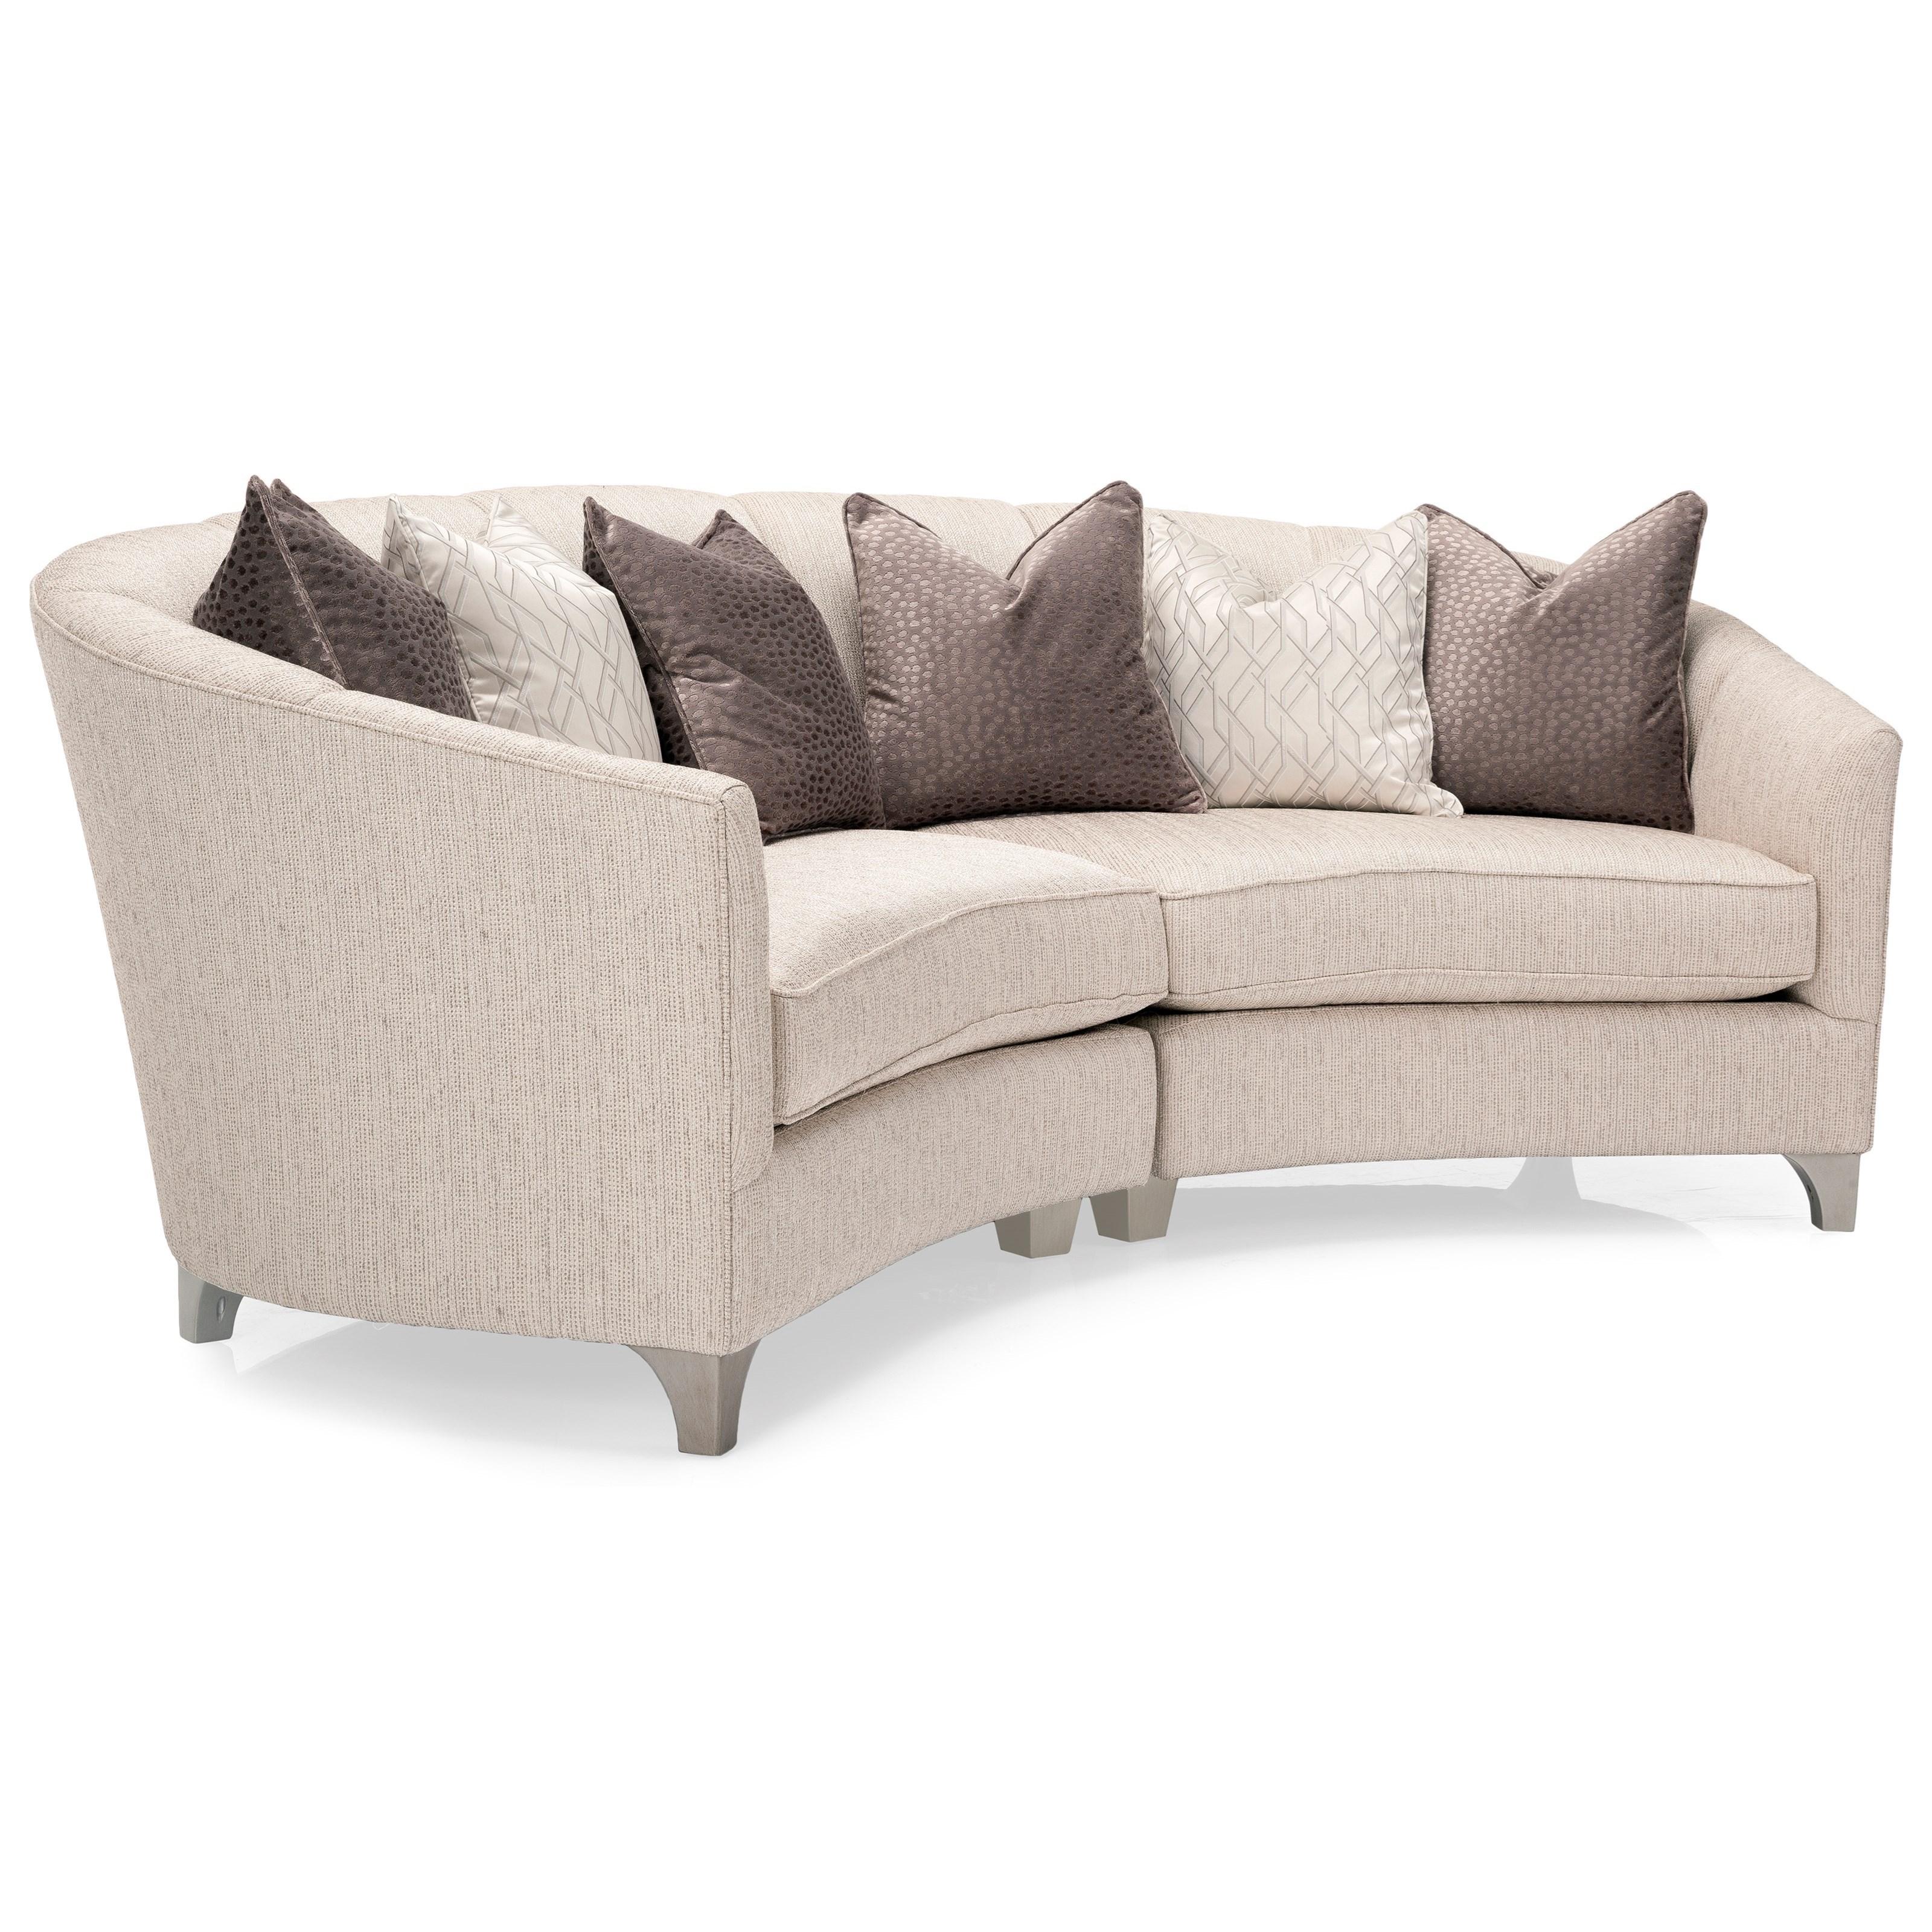 Decor-Rest 2784 2 Pc Sectional Sofa - Item Number: 2784-06 RHF LOVE+07 LHF LOVE-Cream